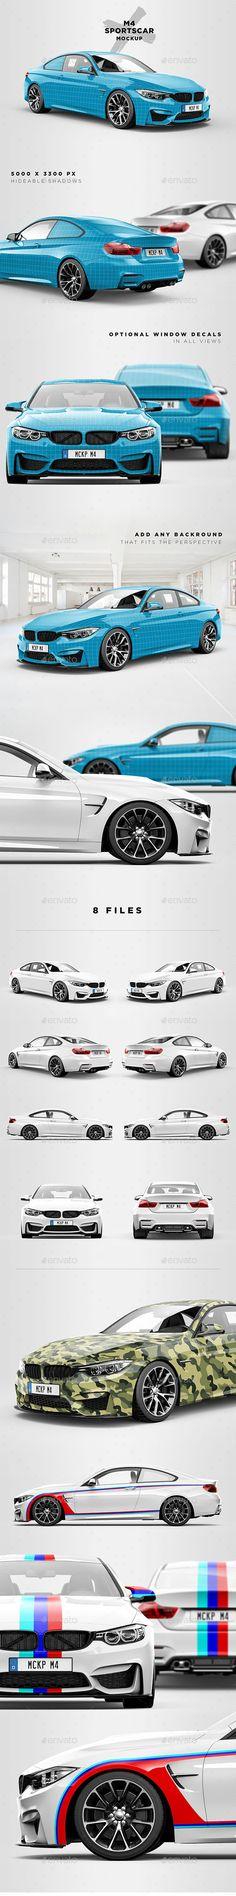 M4 Sportscar Mockup